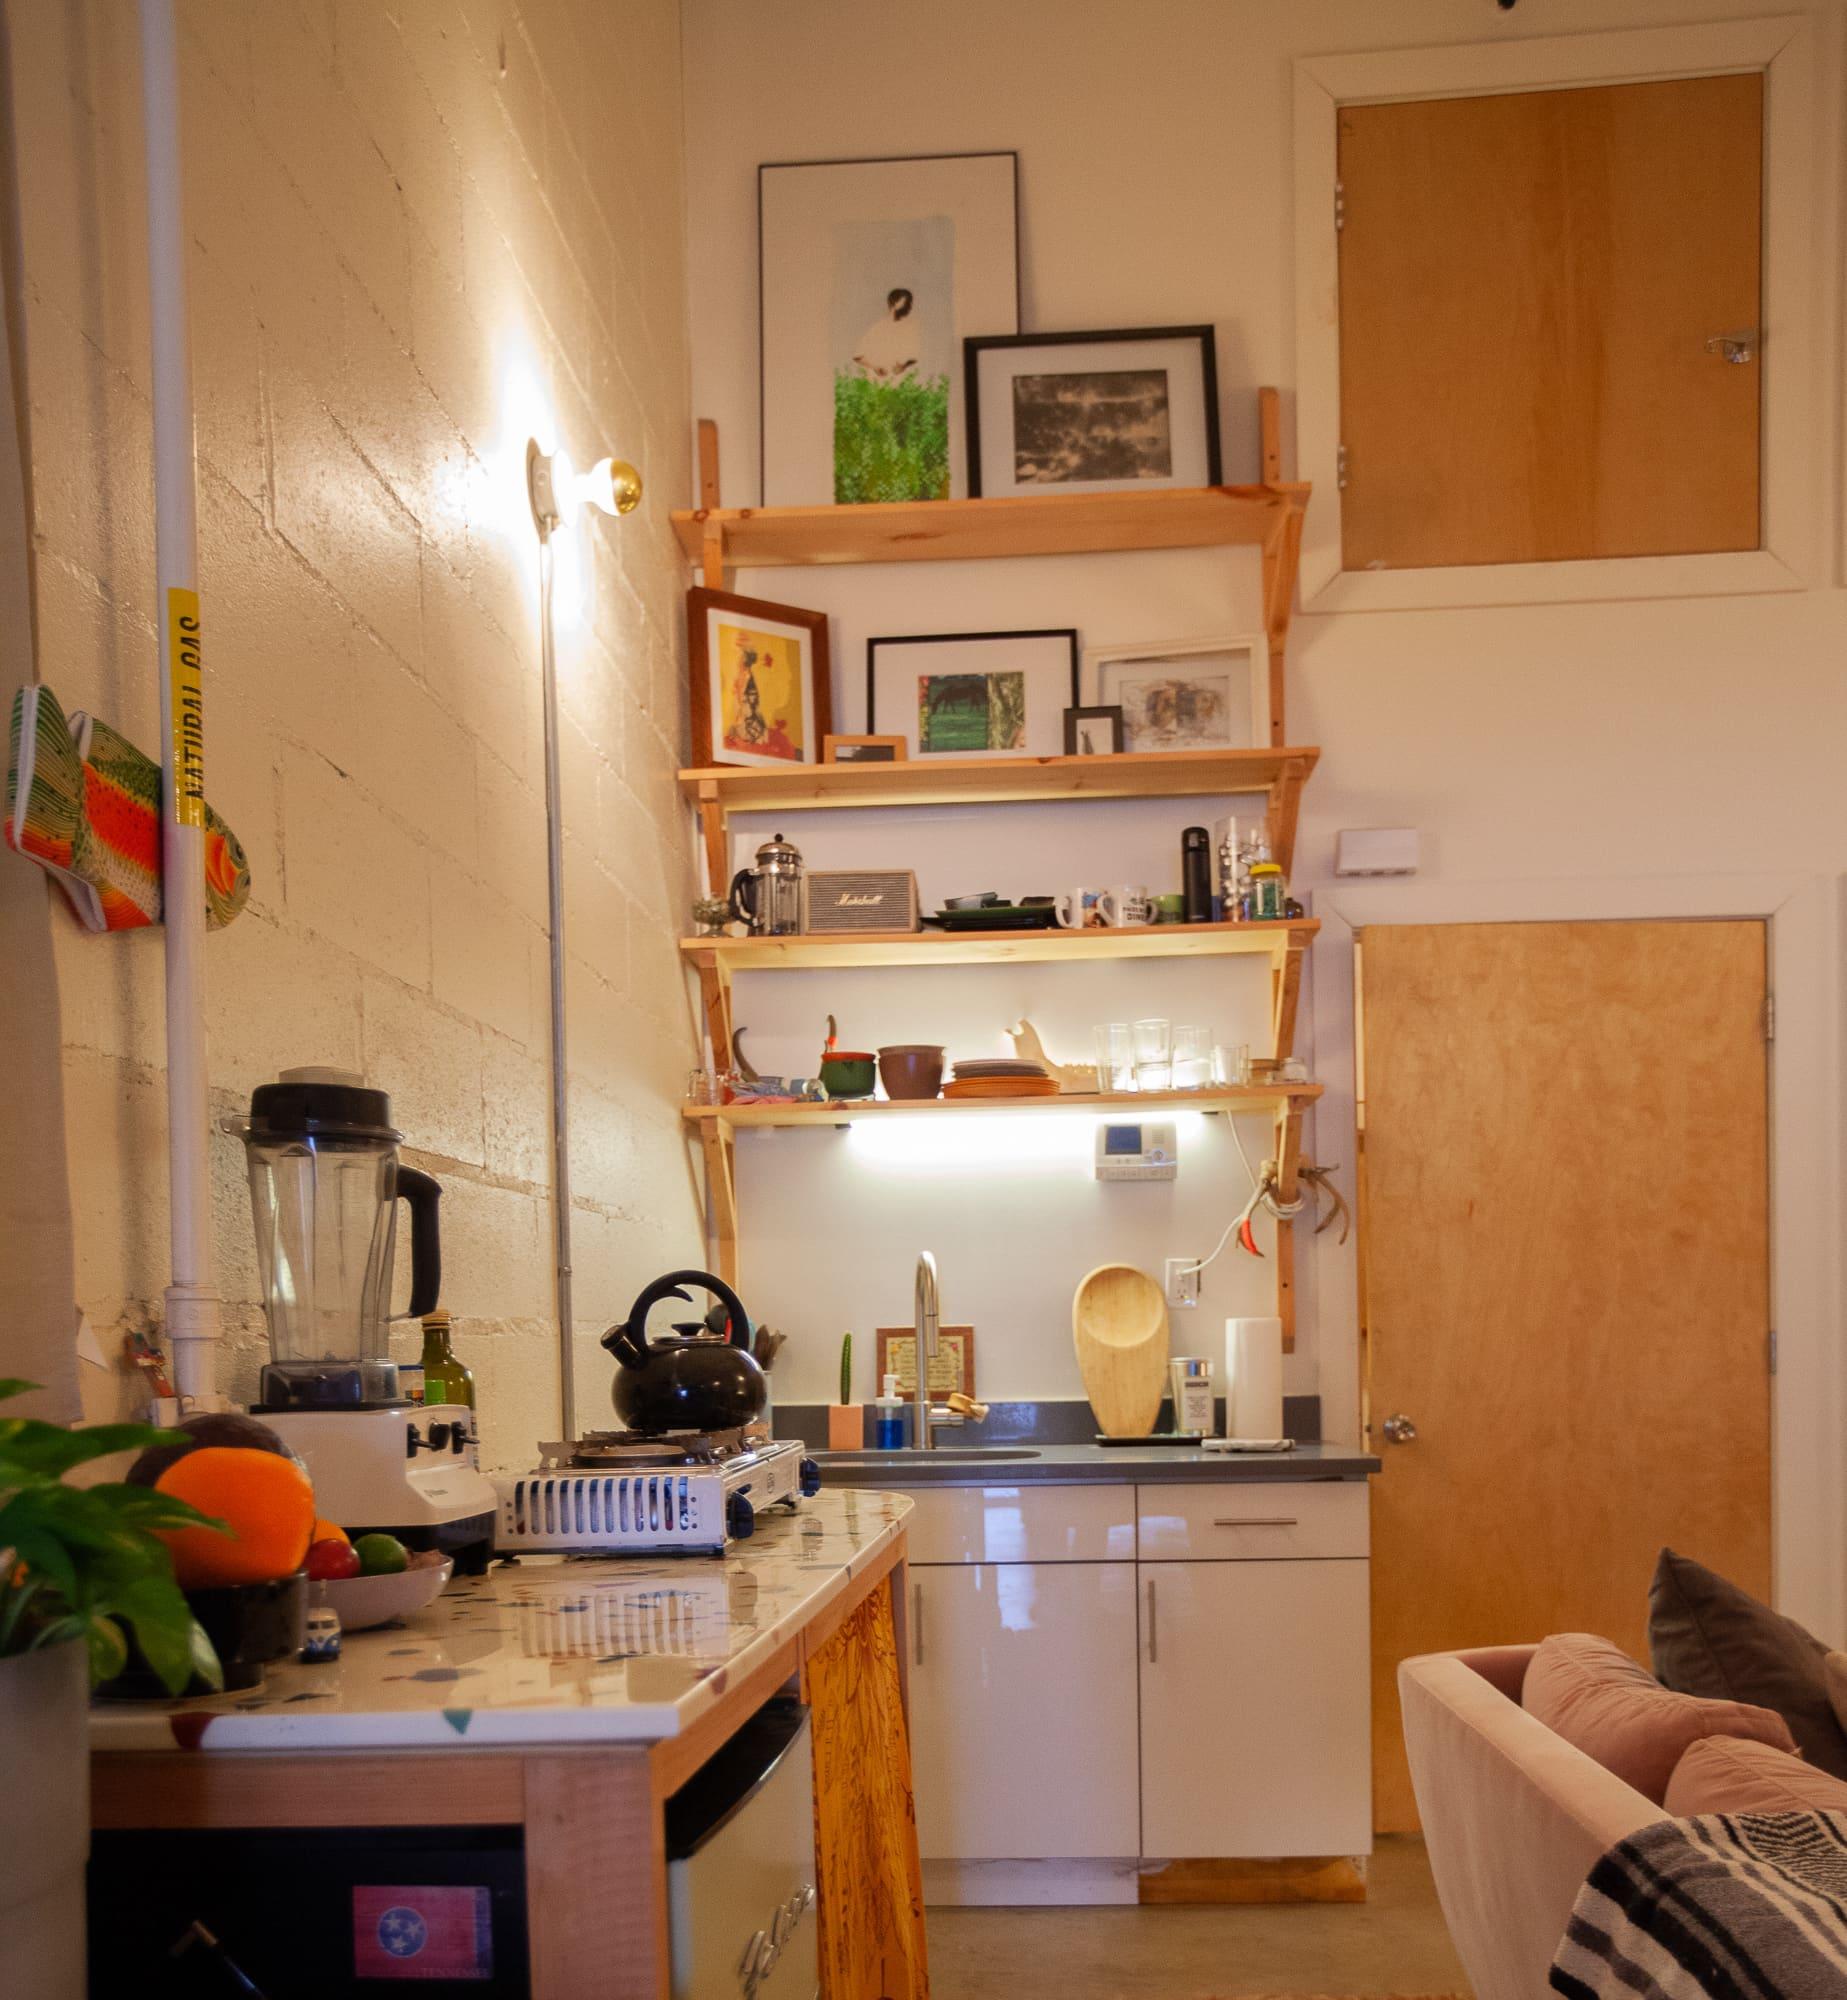 Brooklyn Studio Apartments: Van Living Handmade Studio Apartment Brooklyn Tour